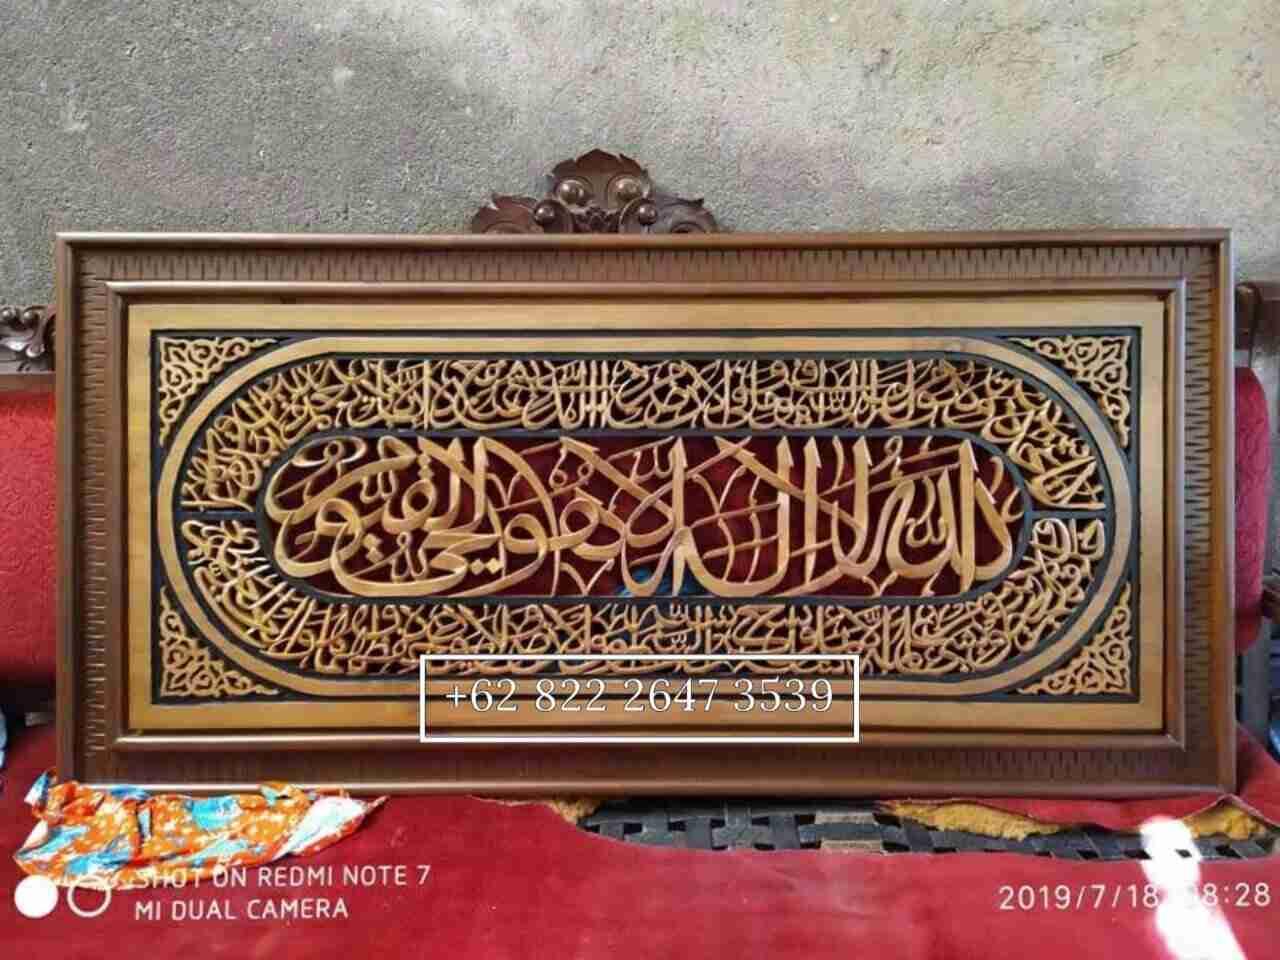 kaligrafi, ayat kursi, kaligrafi ayat kursi